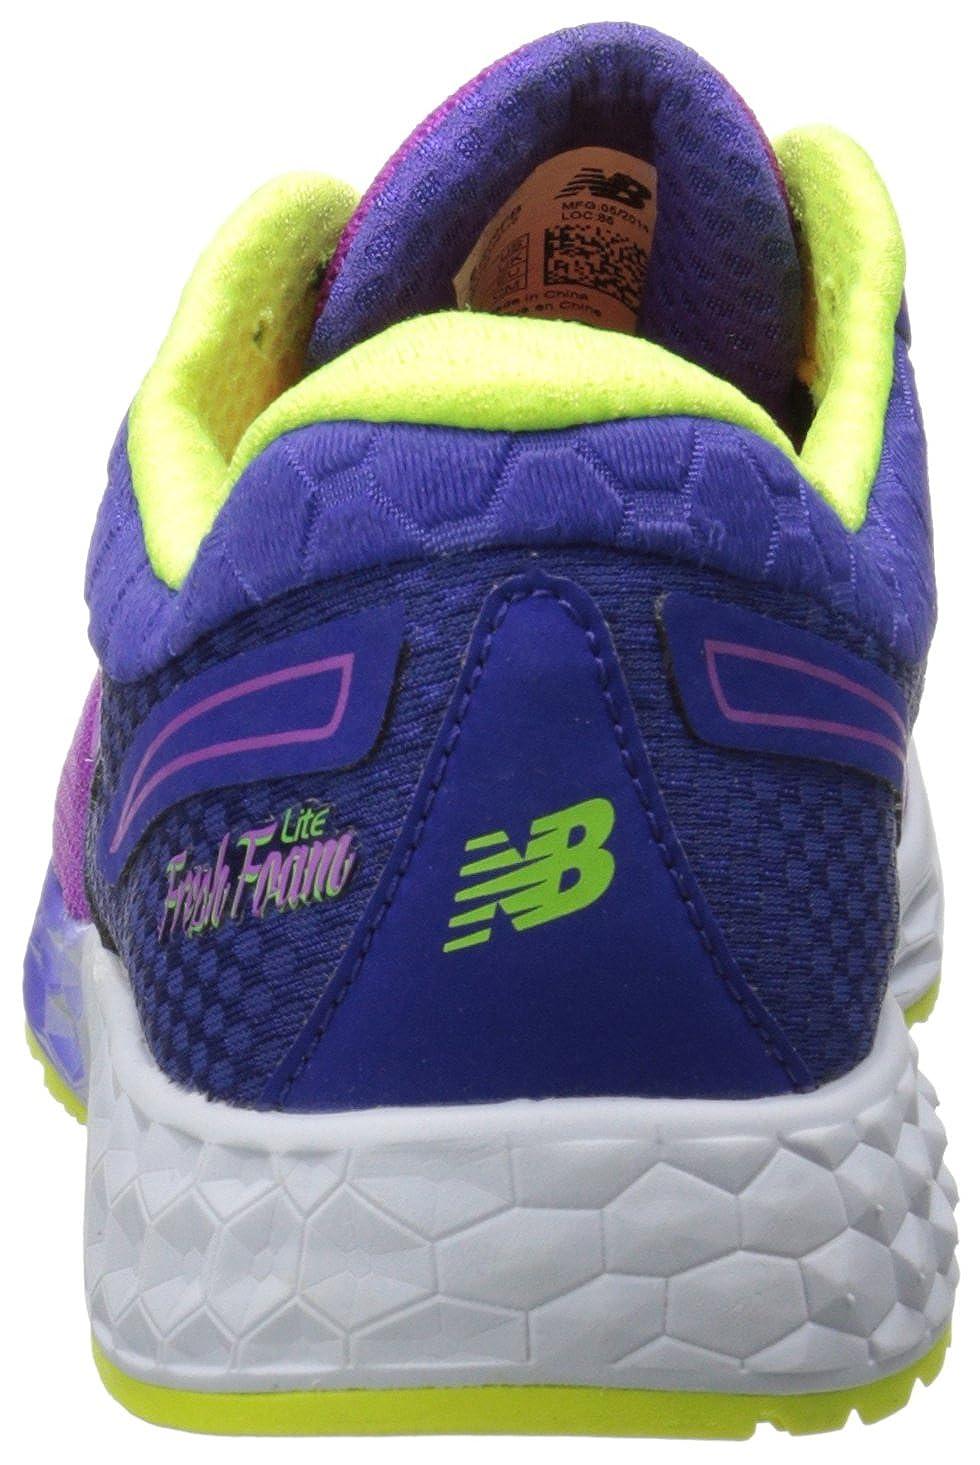 New Balance Nbw1980pb Nbw1980pb Nbw1980pb - Zapatos Mujer afda12